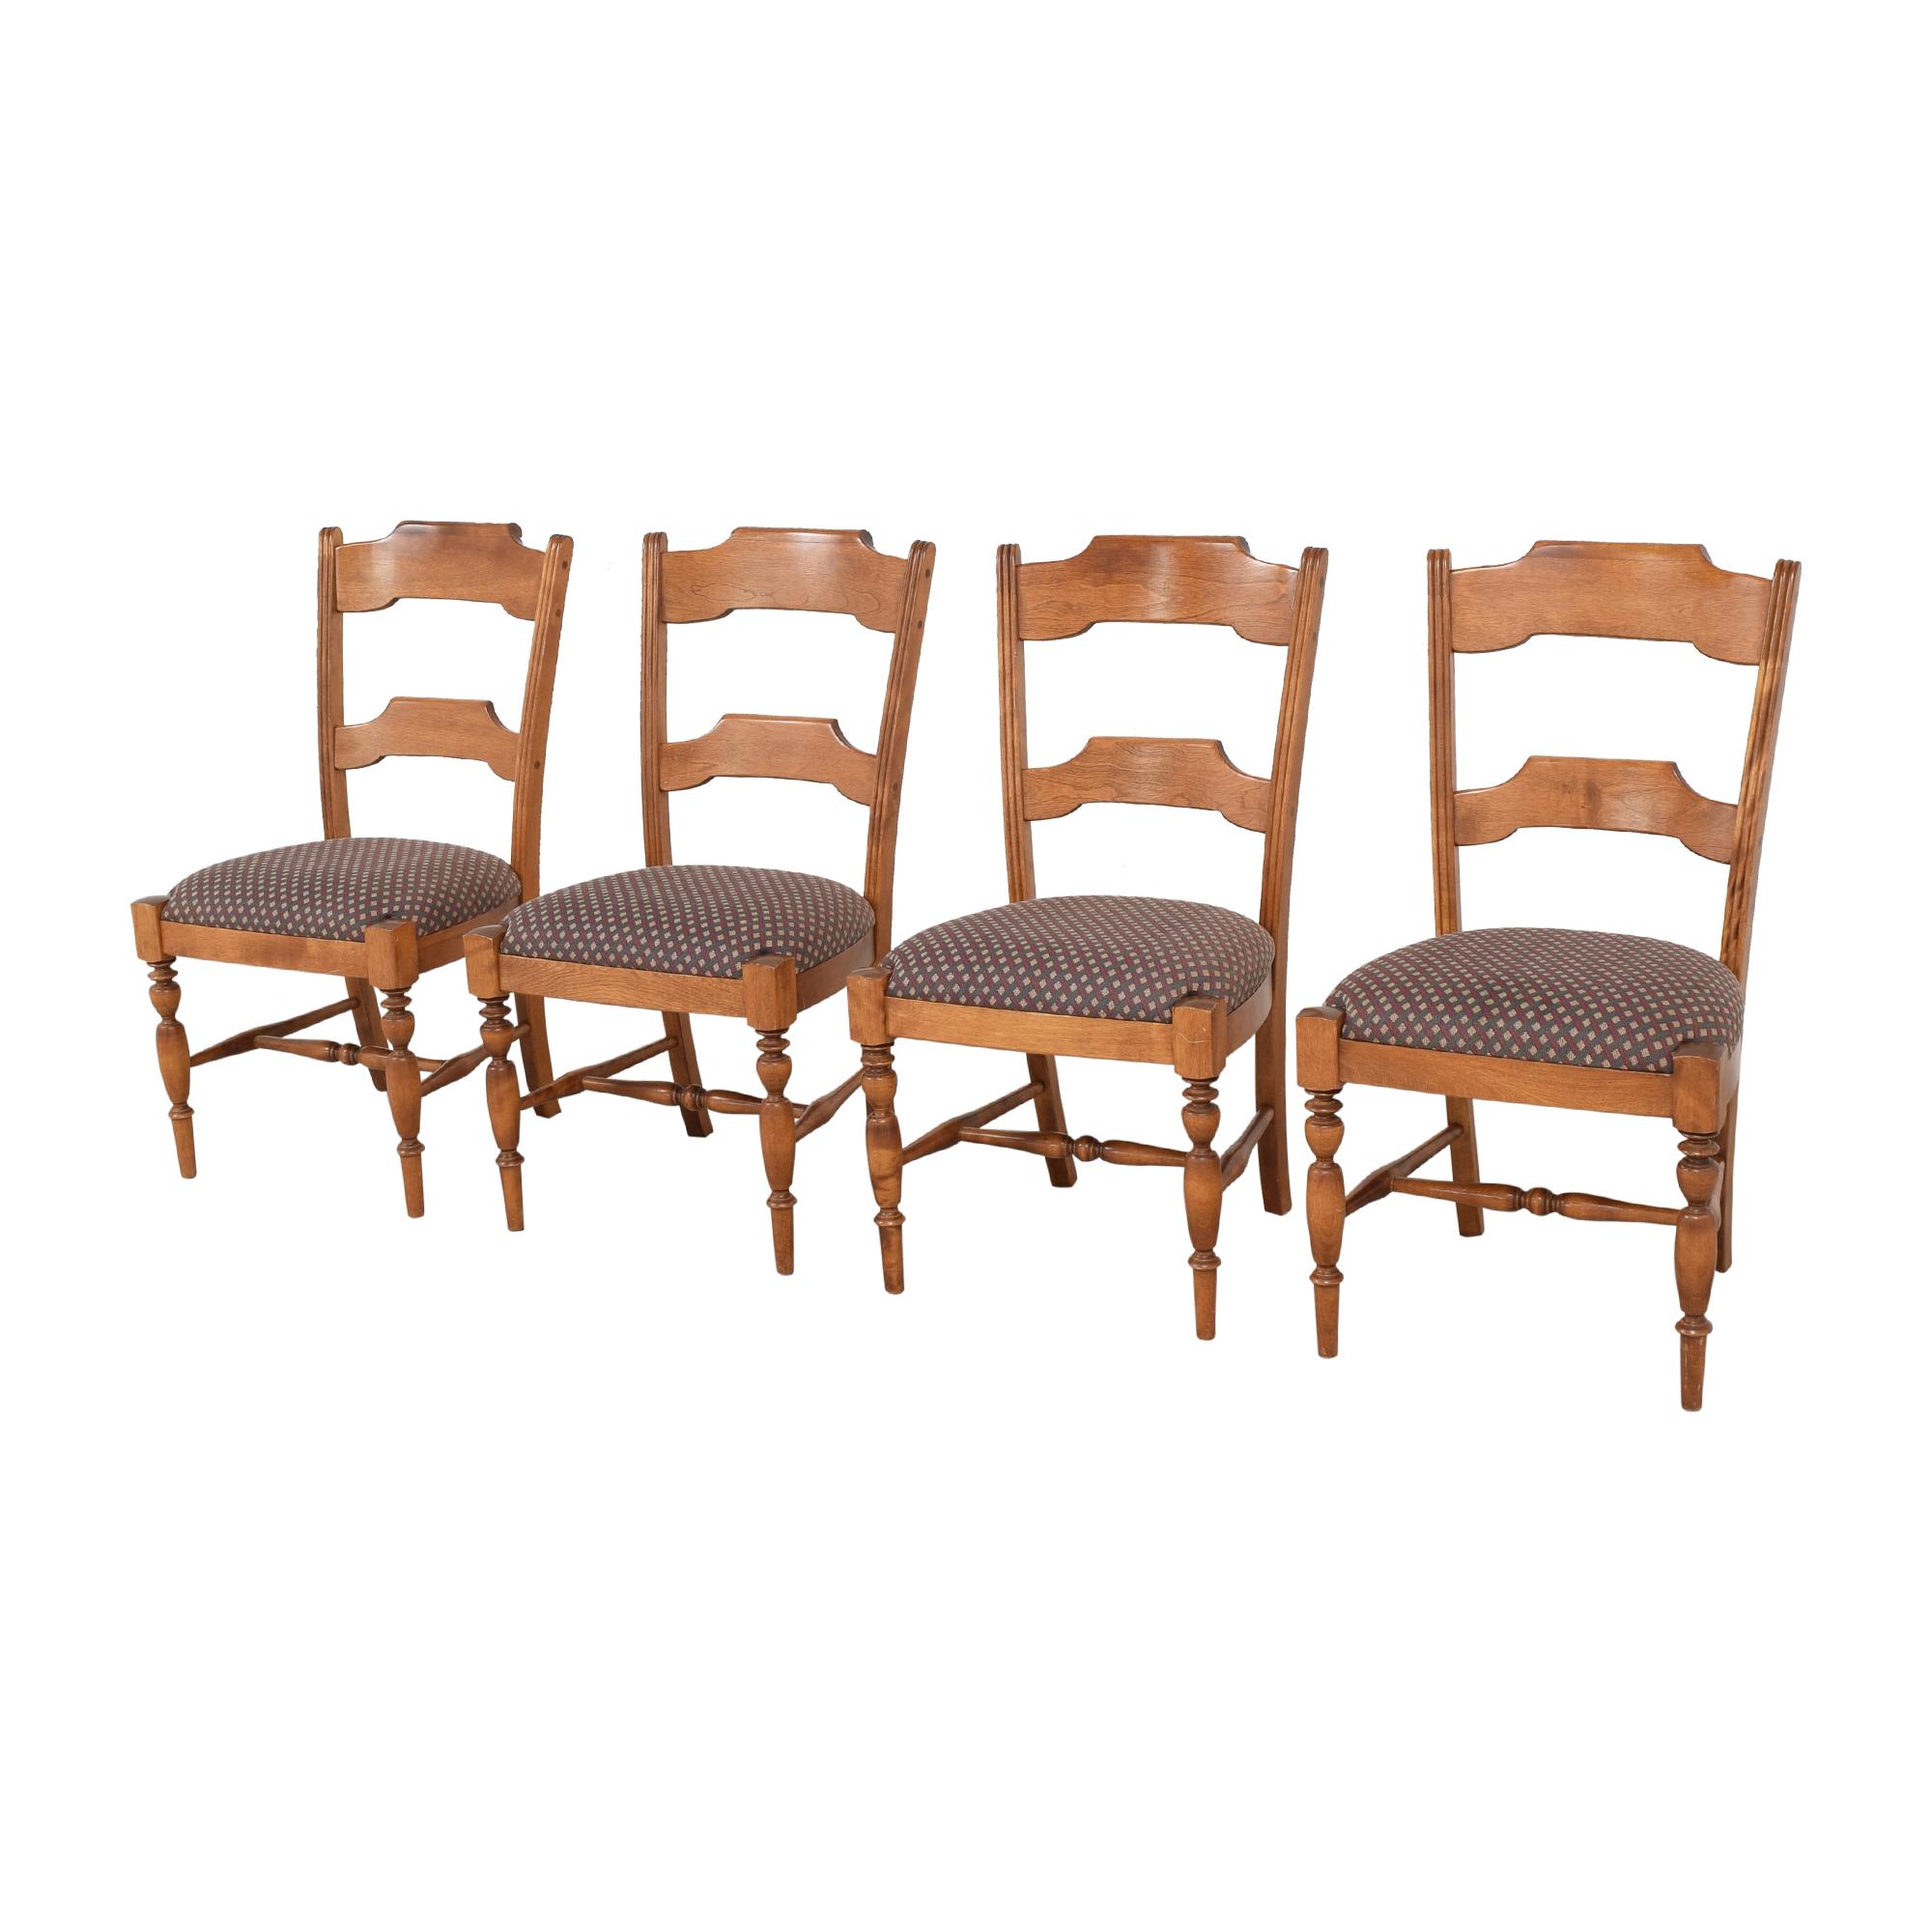 Nichols & Stone Nichols & Stone Upholstered Dining Chairs nyc